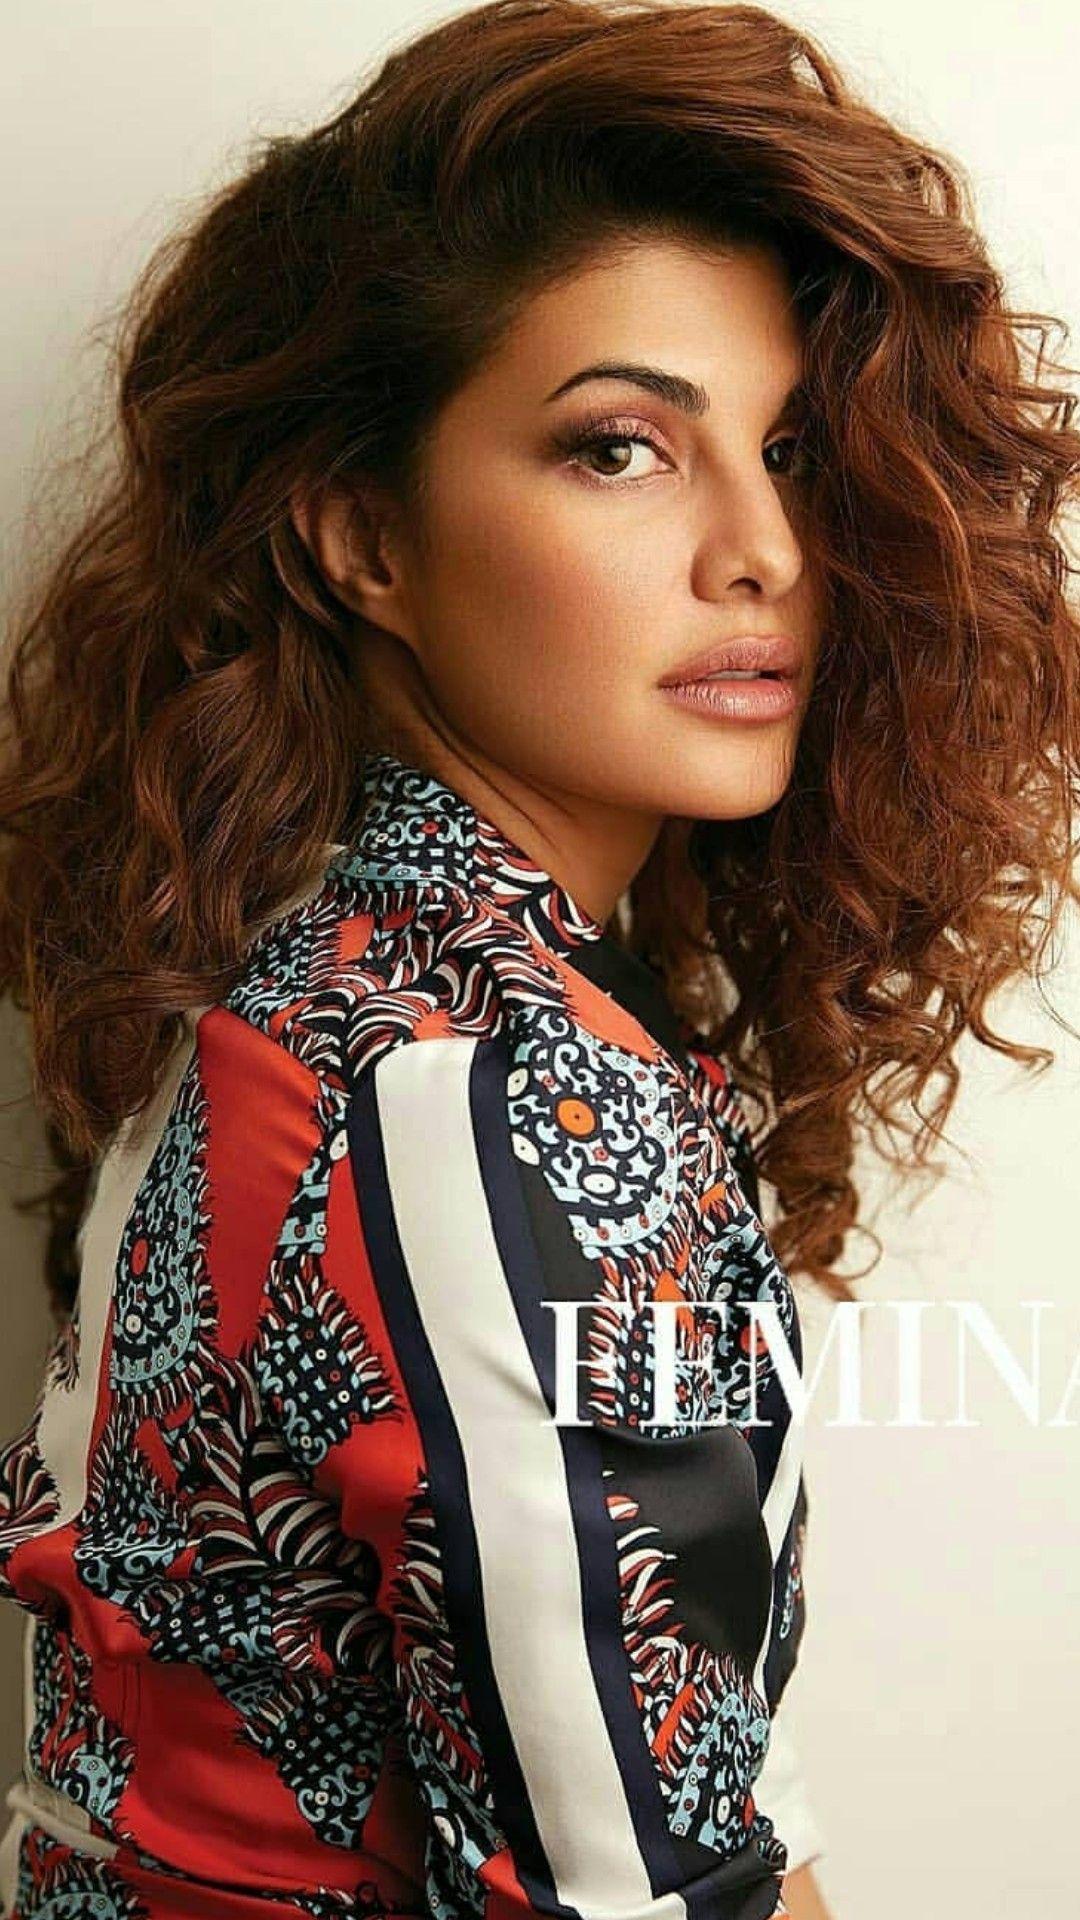 Follow Me Maliha Tabassum Jacqueline In 2019 Jacqueline